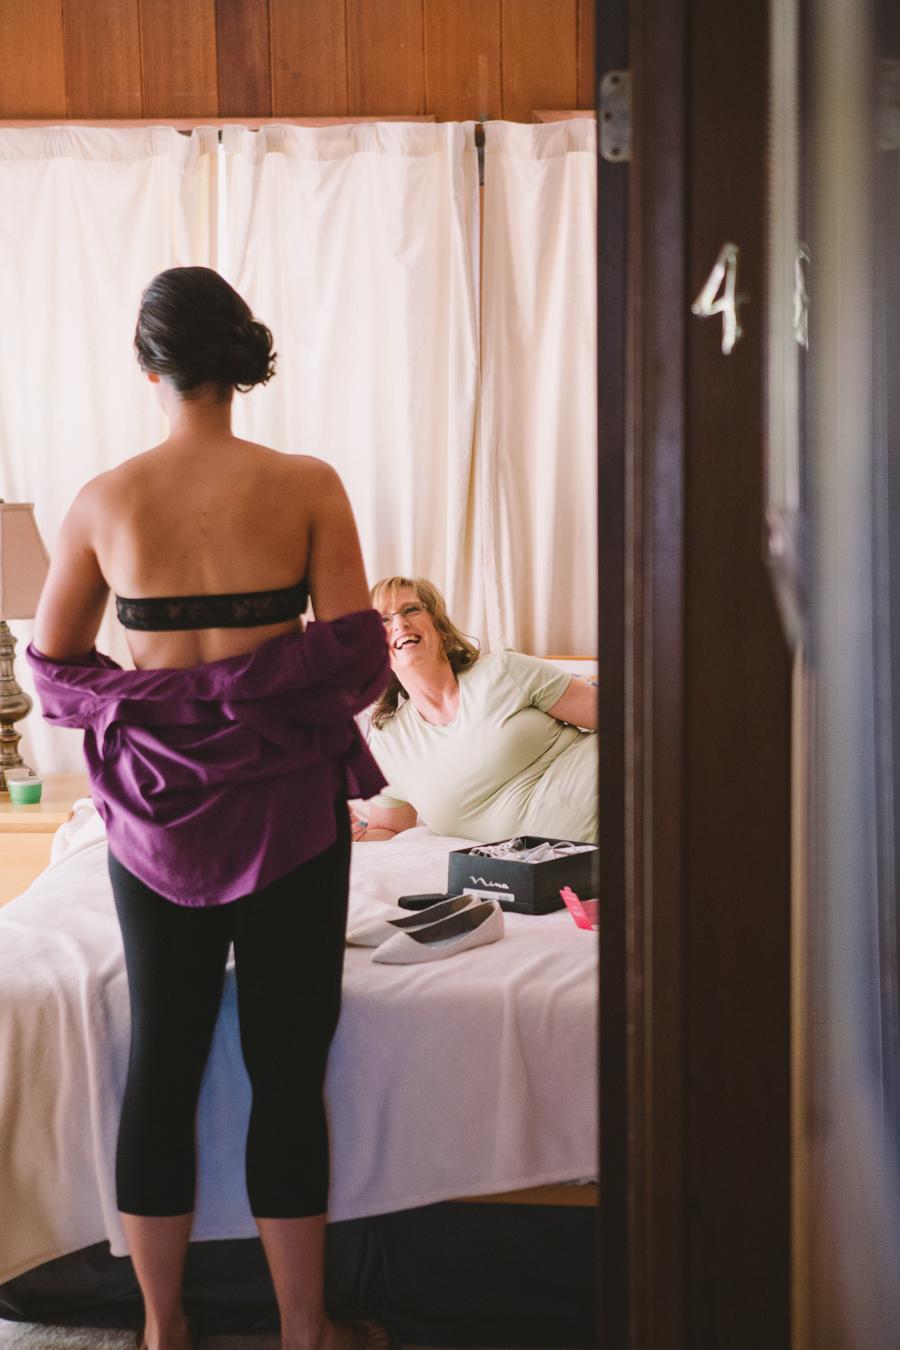 pema-osel-ling-wedding-photography (21)